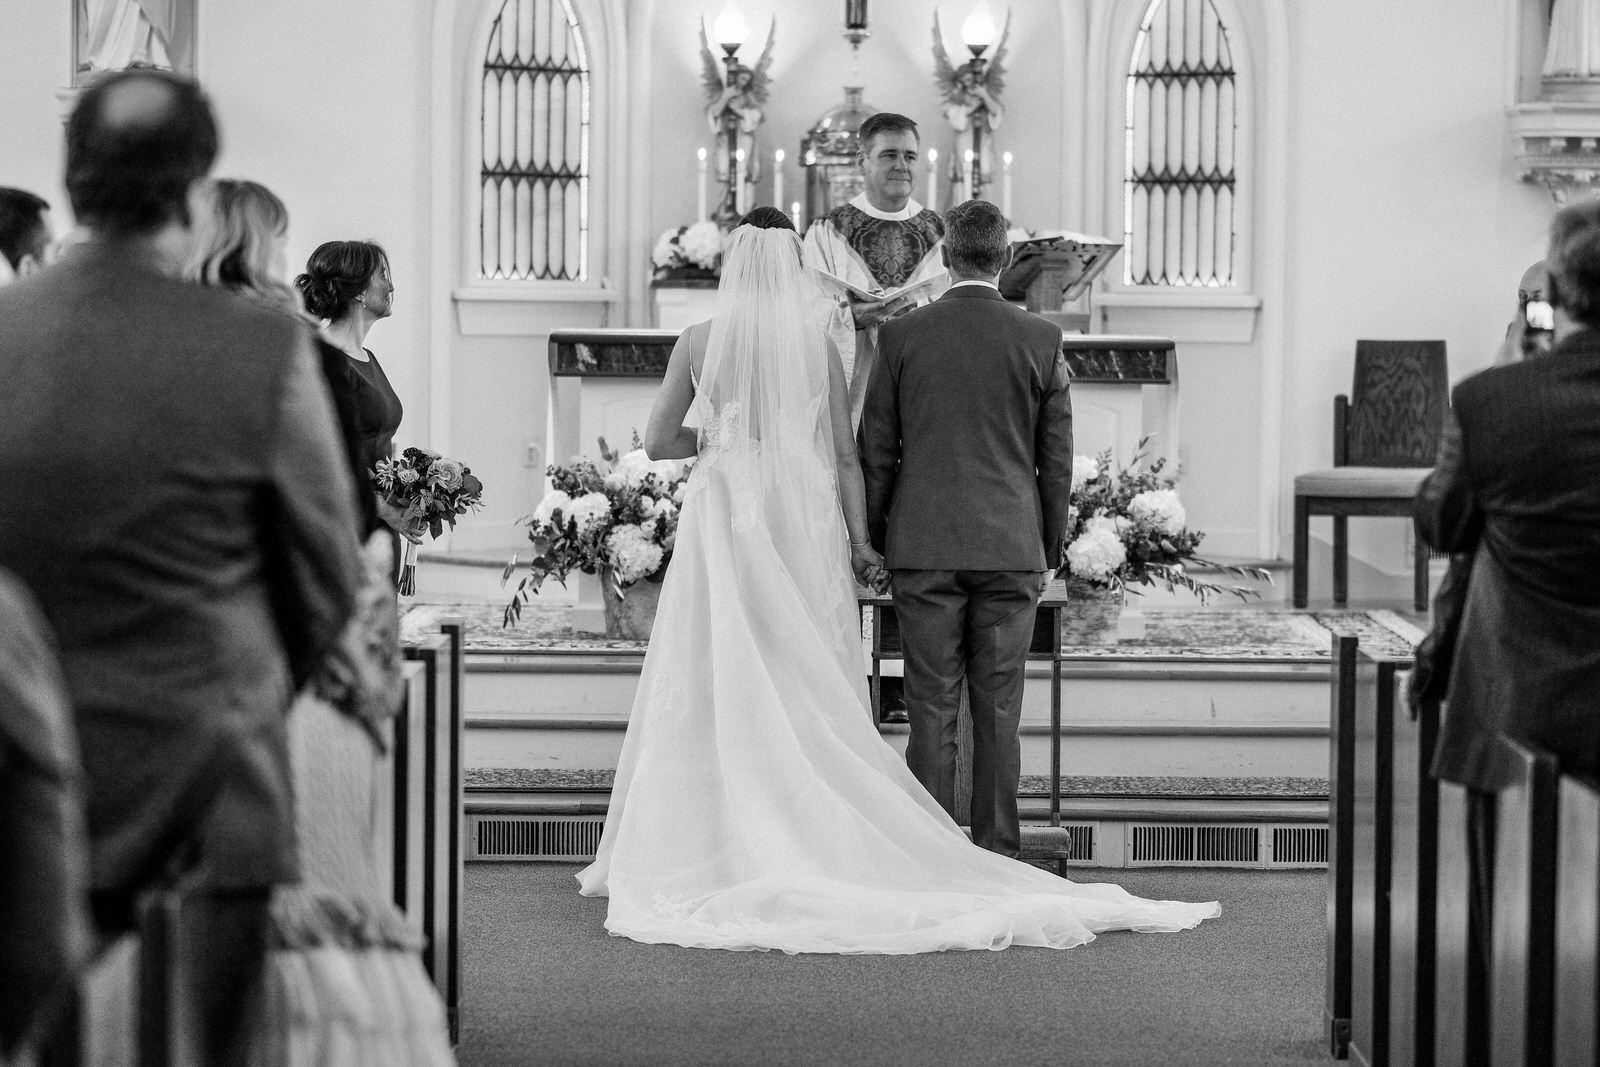 Zorvino-Vineyards-Fall-Wedding-Photography-257.jpg